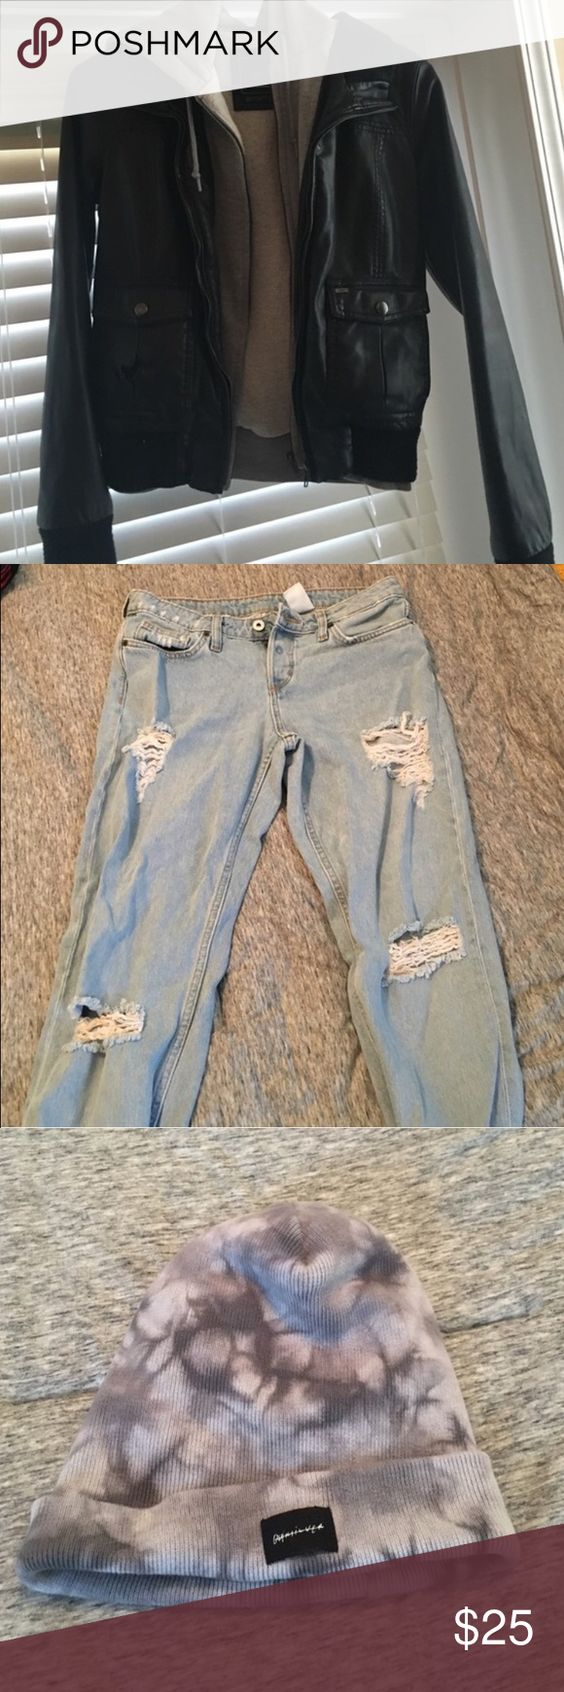 NEW BUNDLE! Obey pleather jacket, H&M boyfriend jeans, and Quiksilver acid wash beanie! Other